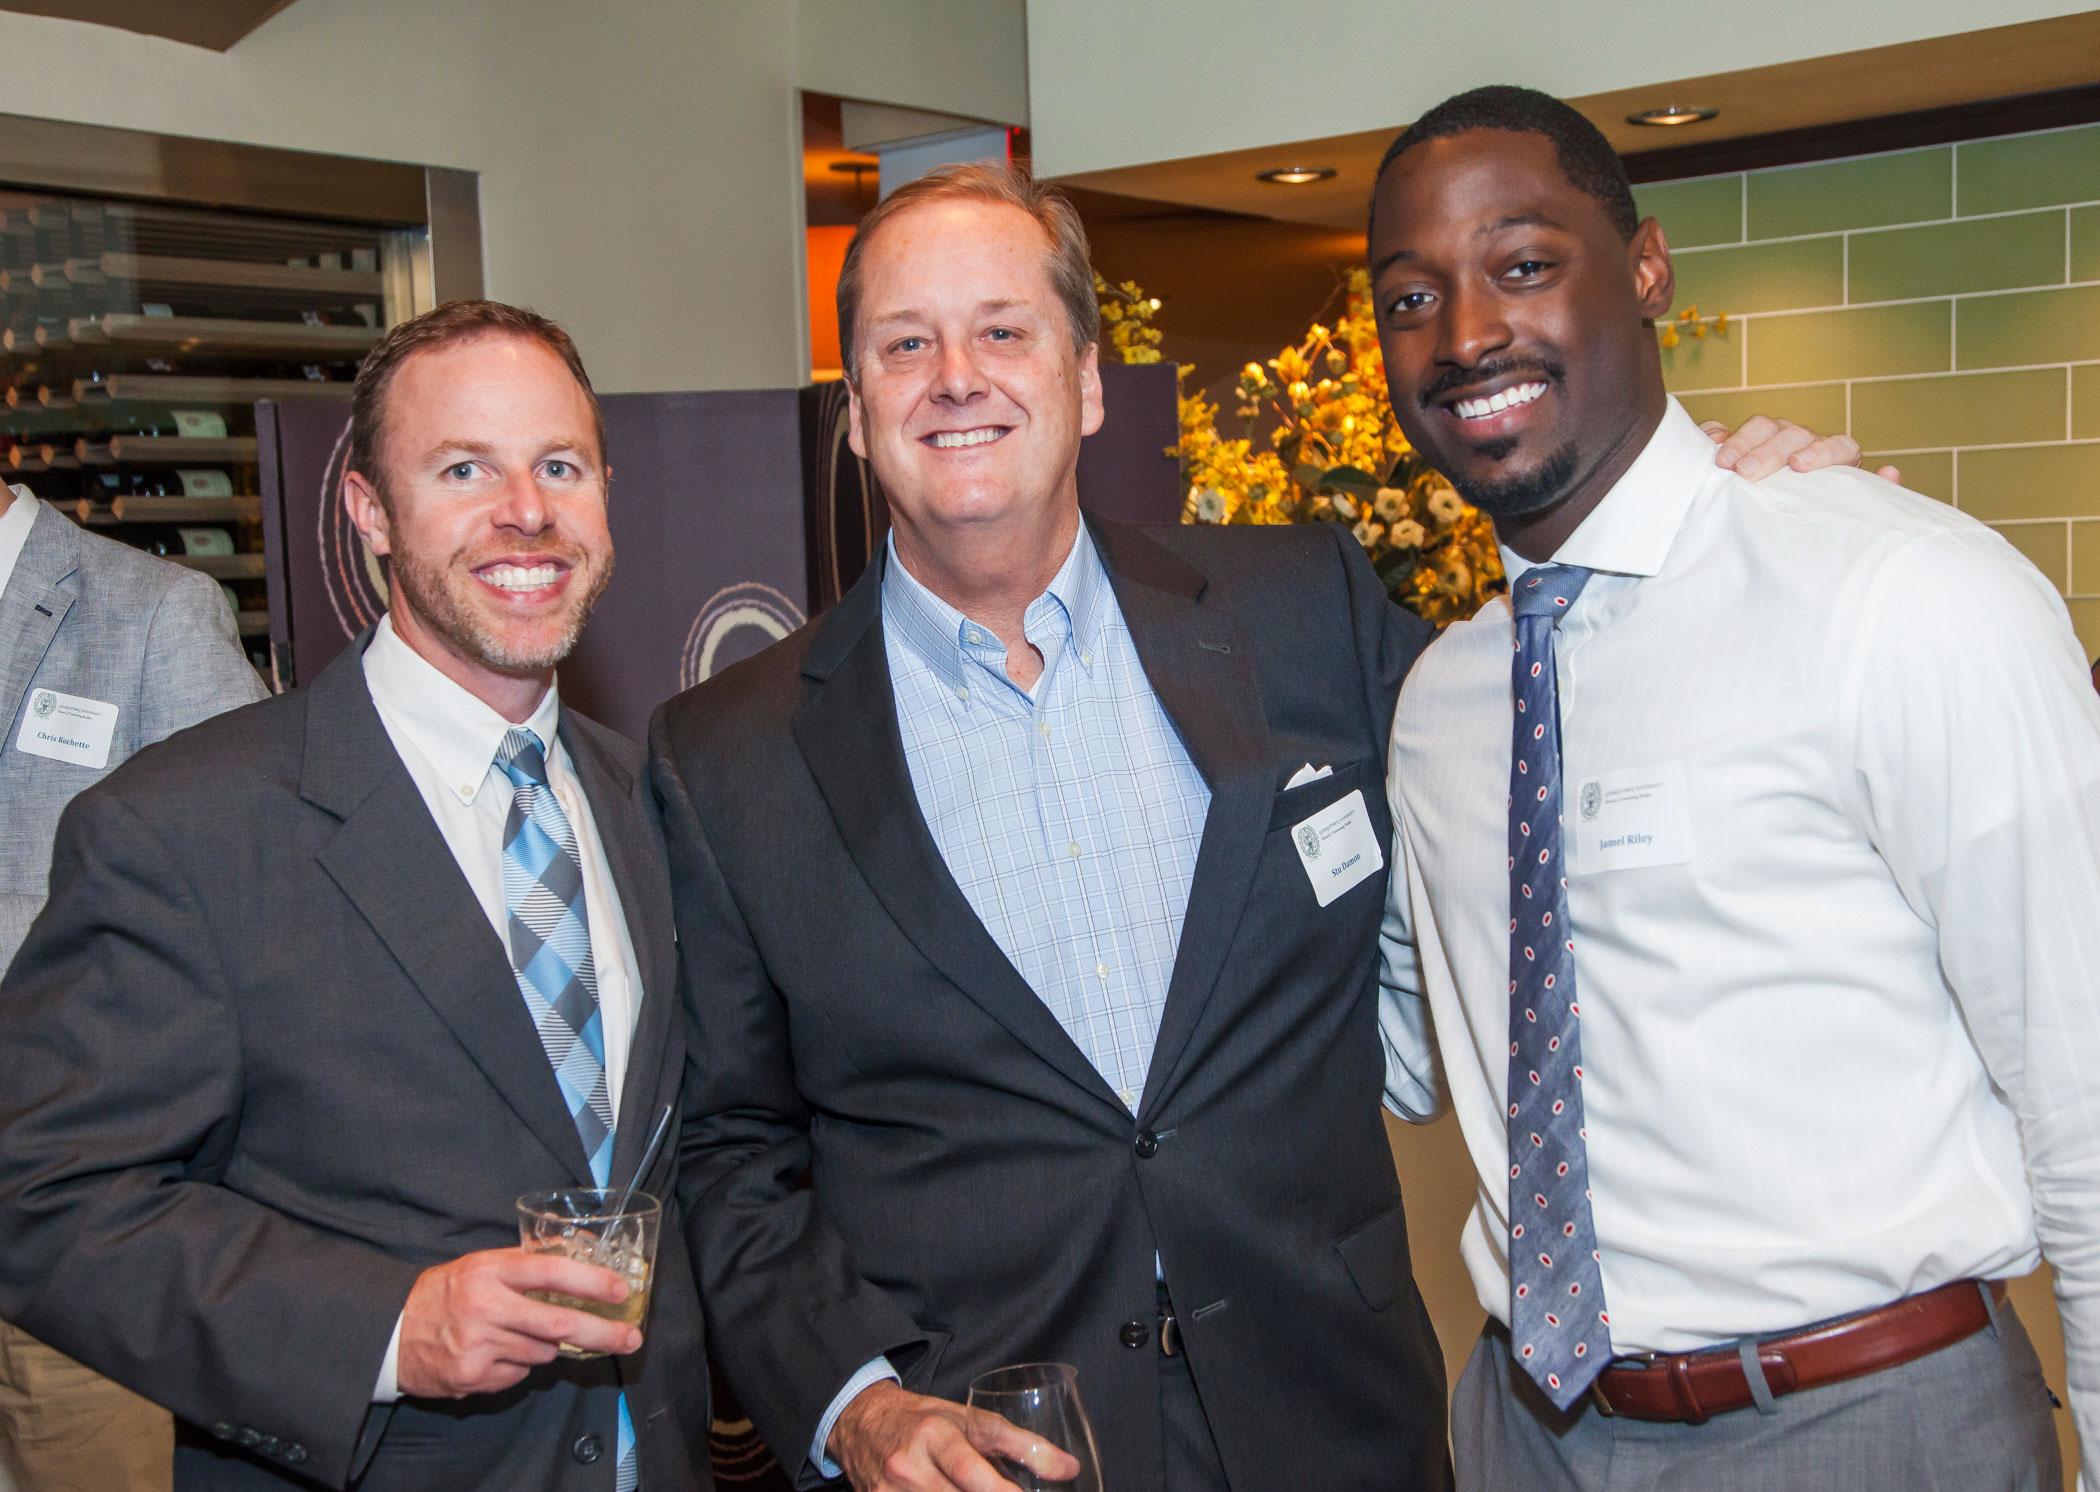 Stuart Levy, Faculty Member Stu Damon, and Jamel Riley